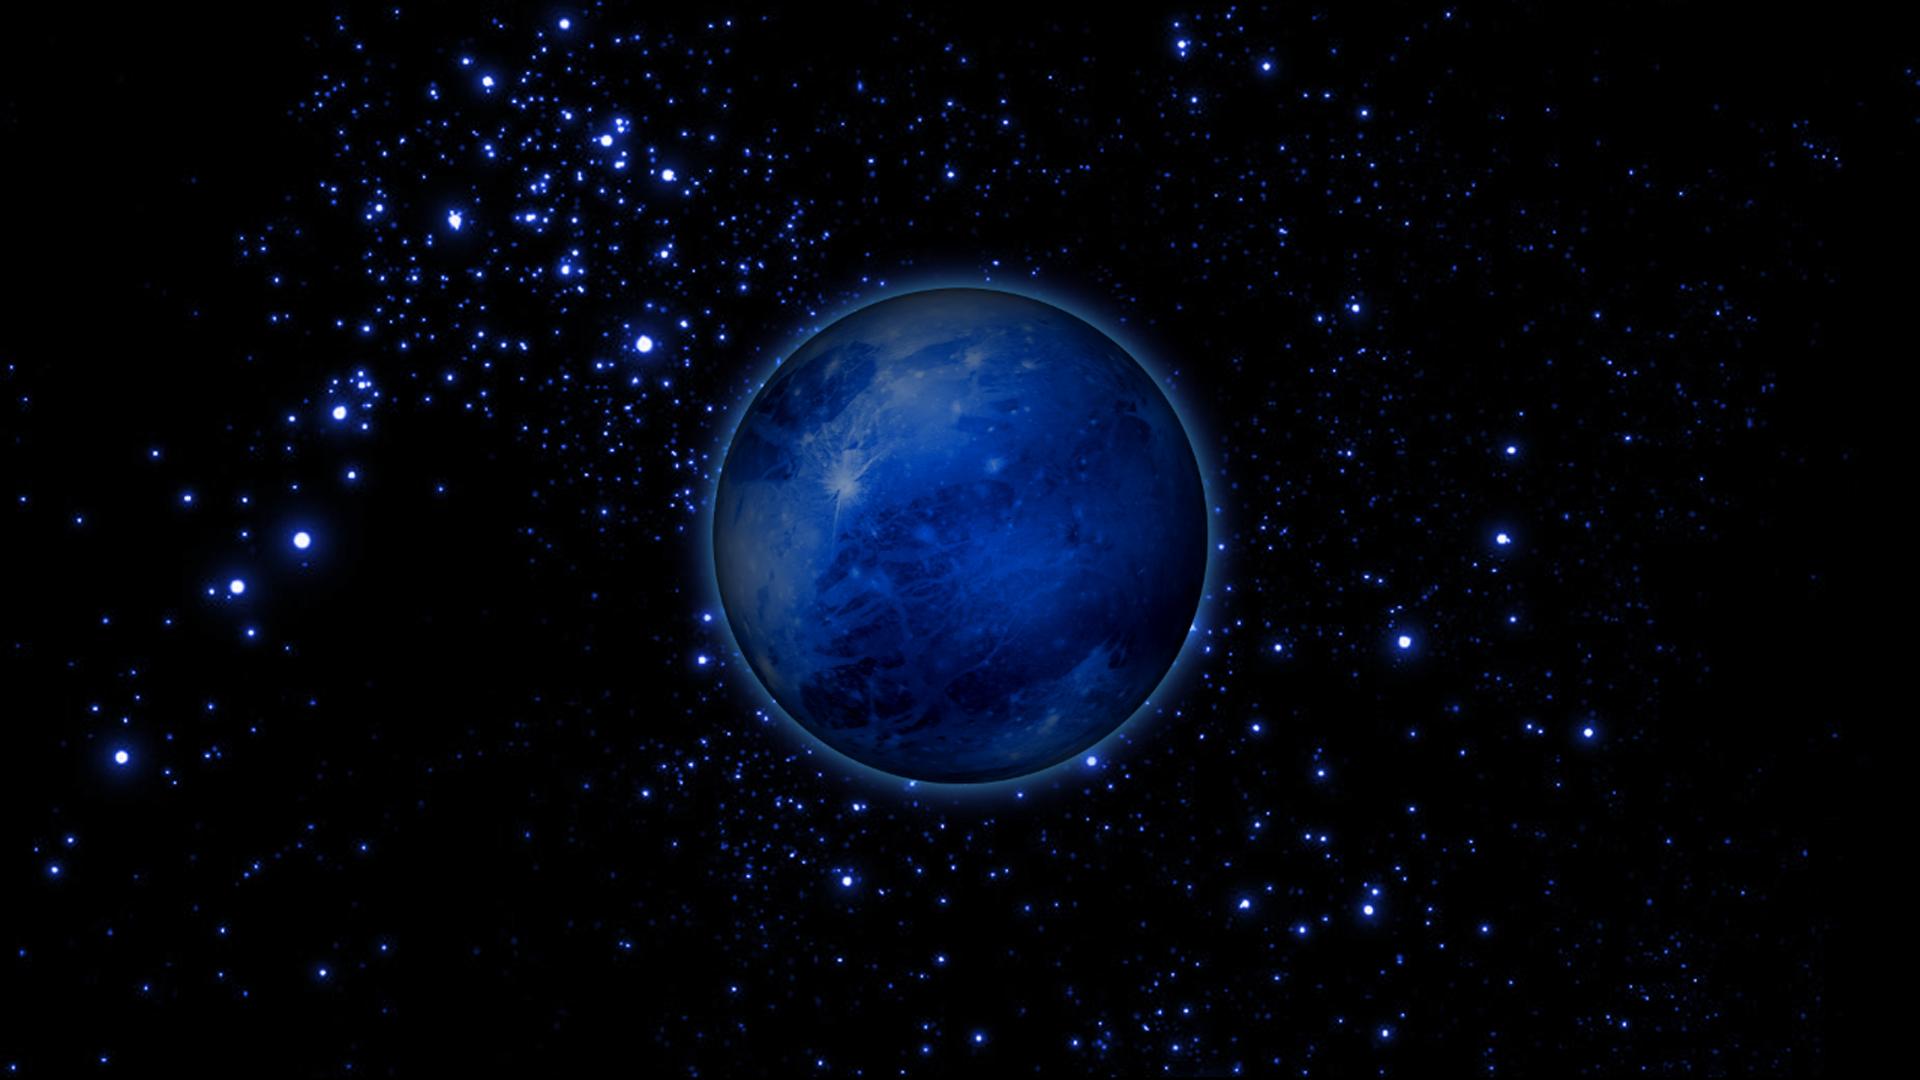 Distant Planet wallpaper - 276333